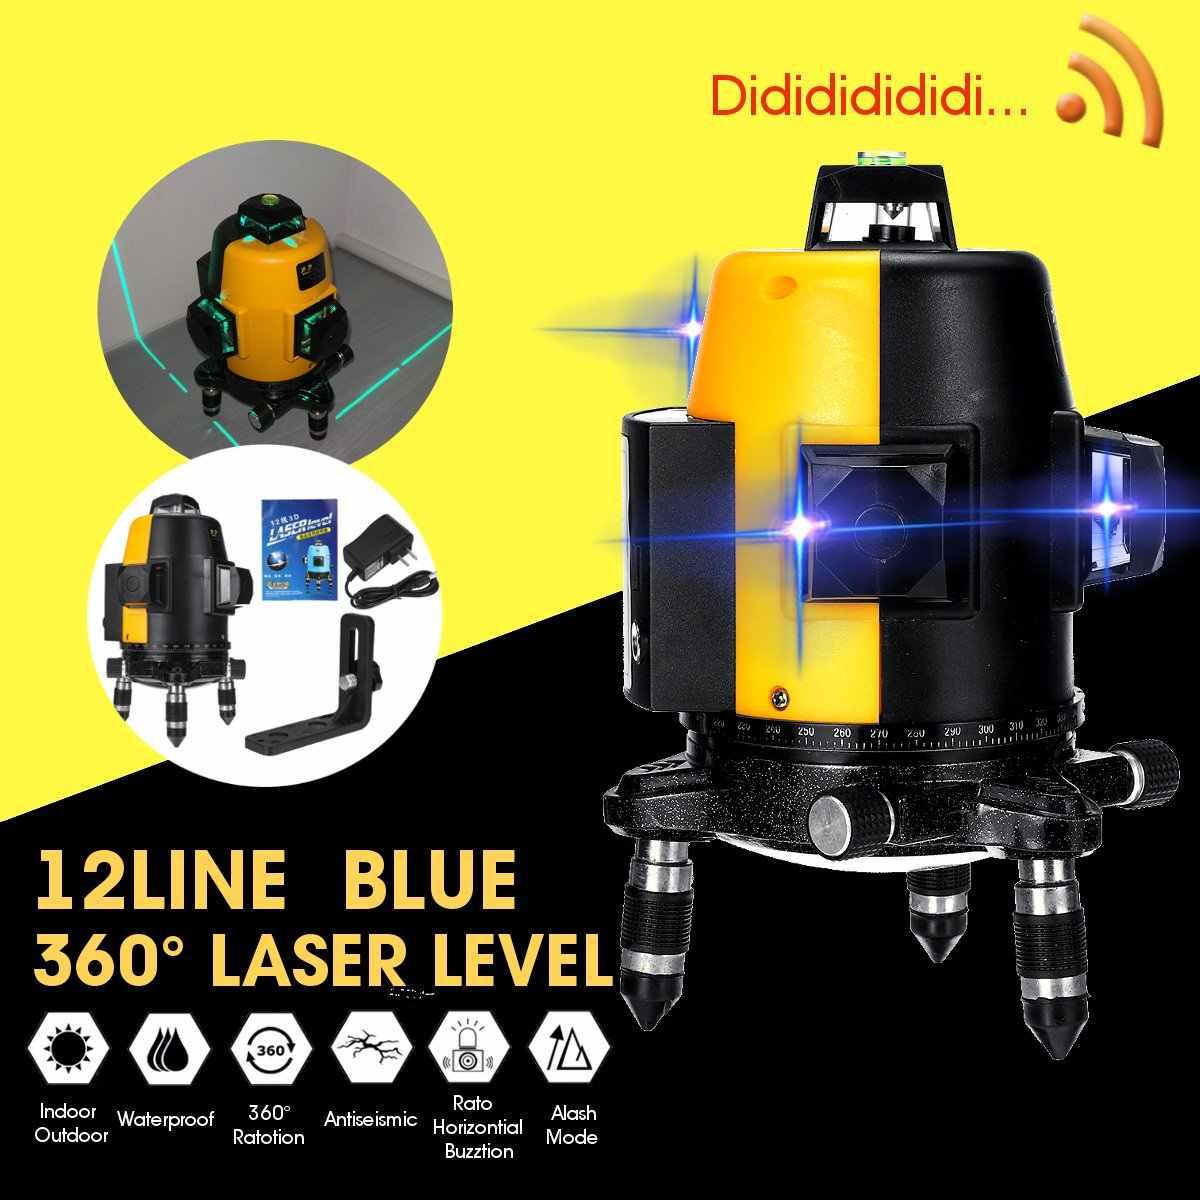 Professional Blue Laser Level 360 degree 12Line 3D Portable Laser Measuring Horizontal And Vertical Cross